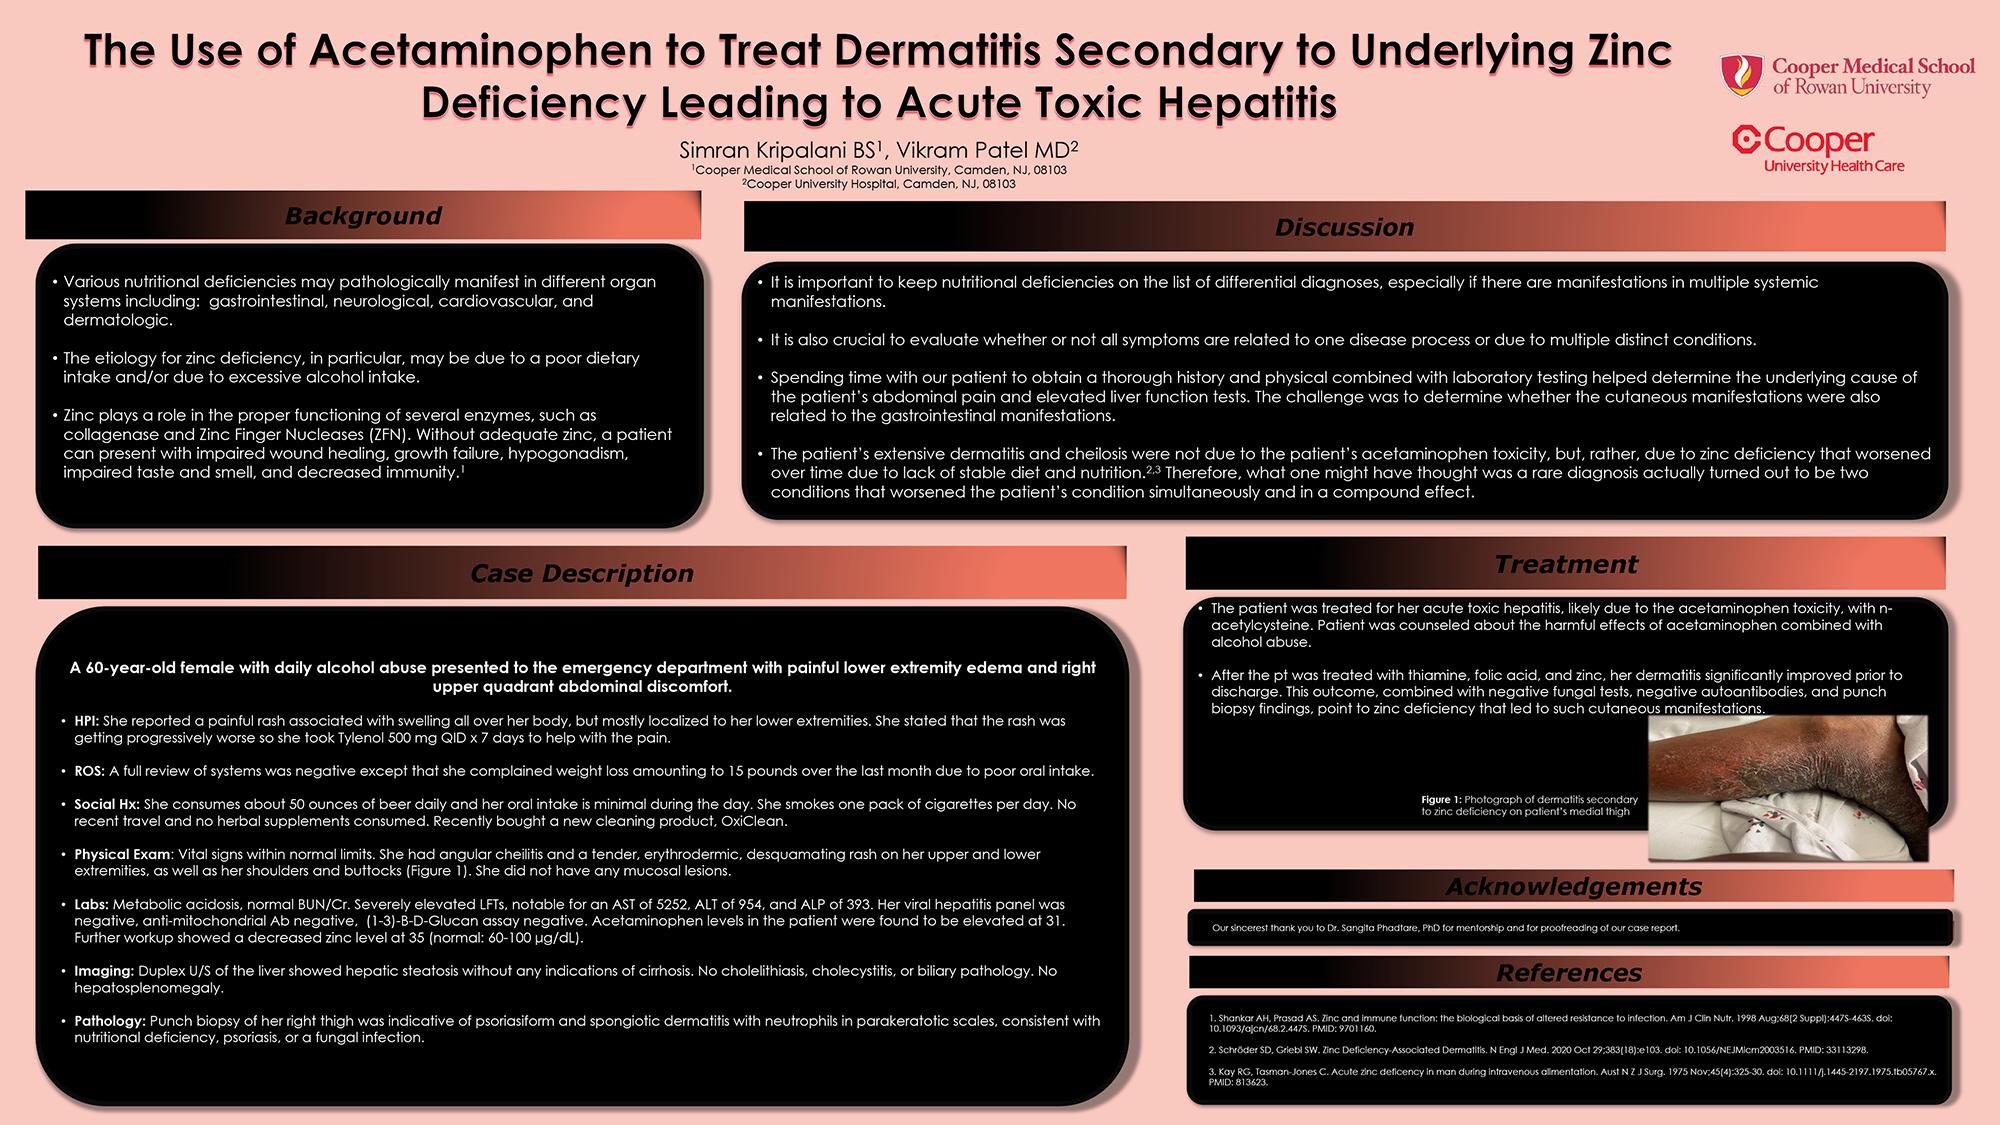 39-CVS-4-The Use of Acetaminophen to Treat Zinc Deficiency Dermatitis